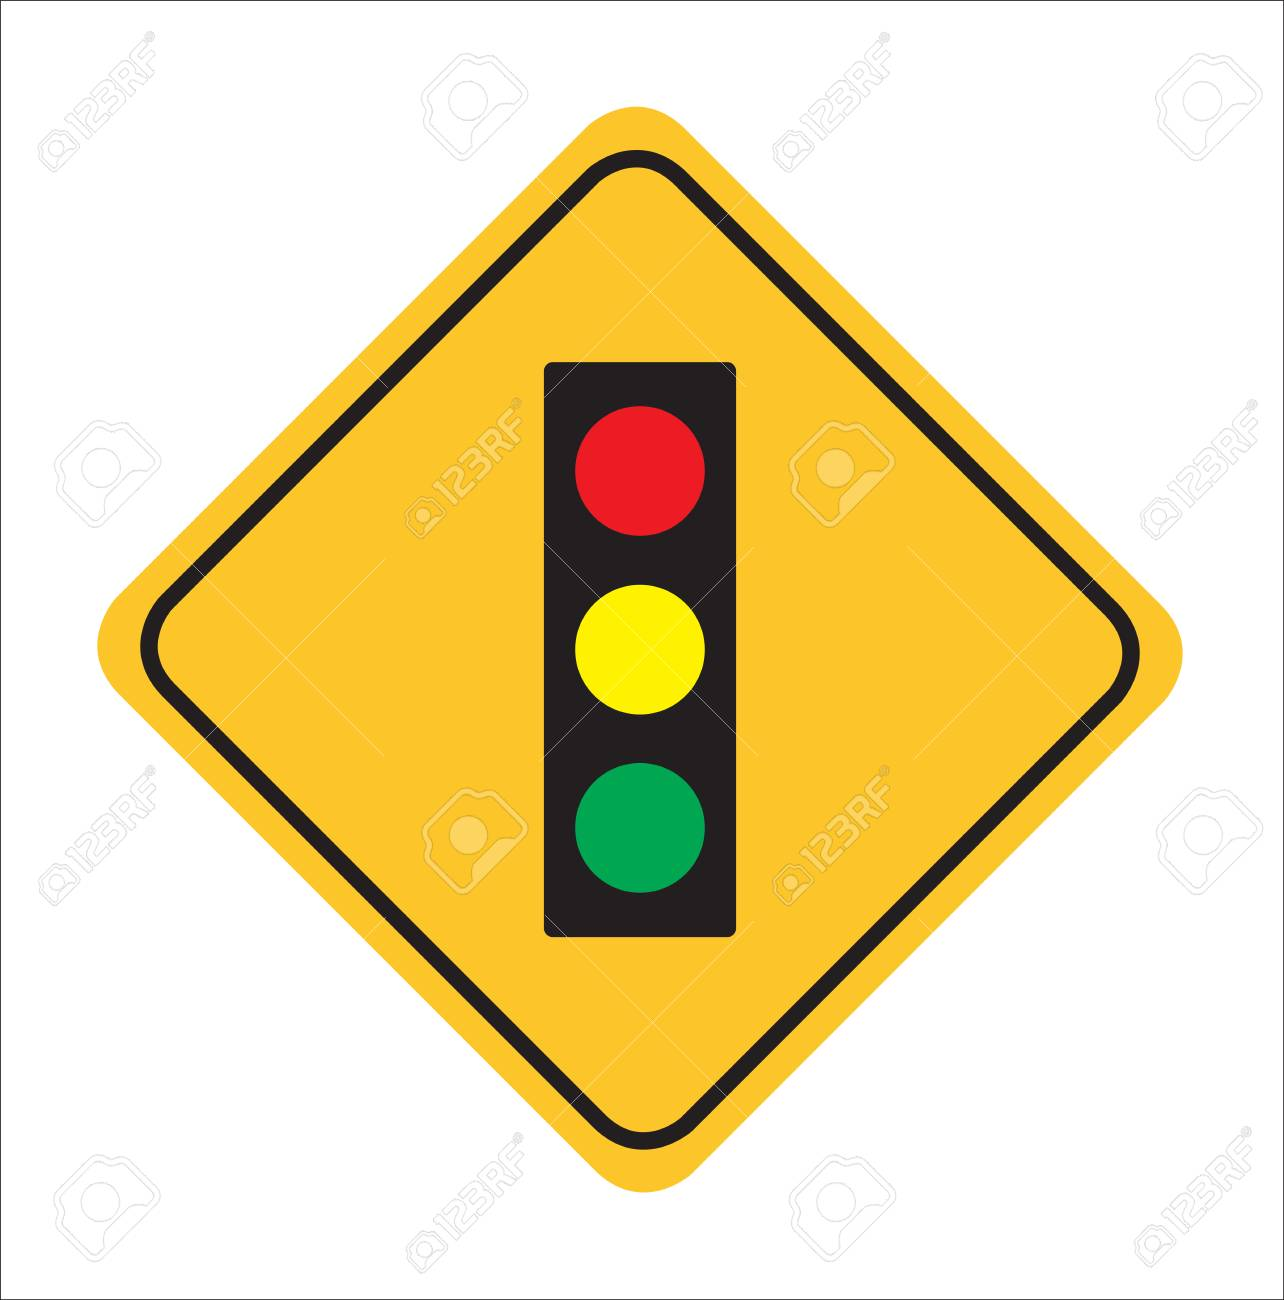 Traffic sign, Traffic light ahead sign background,vactor Illustration - 107863029